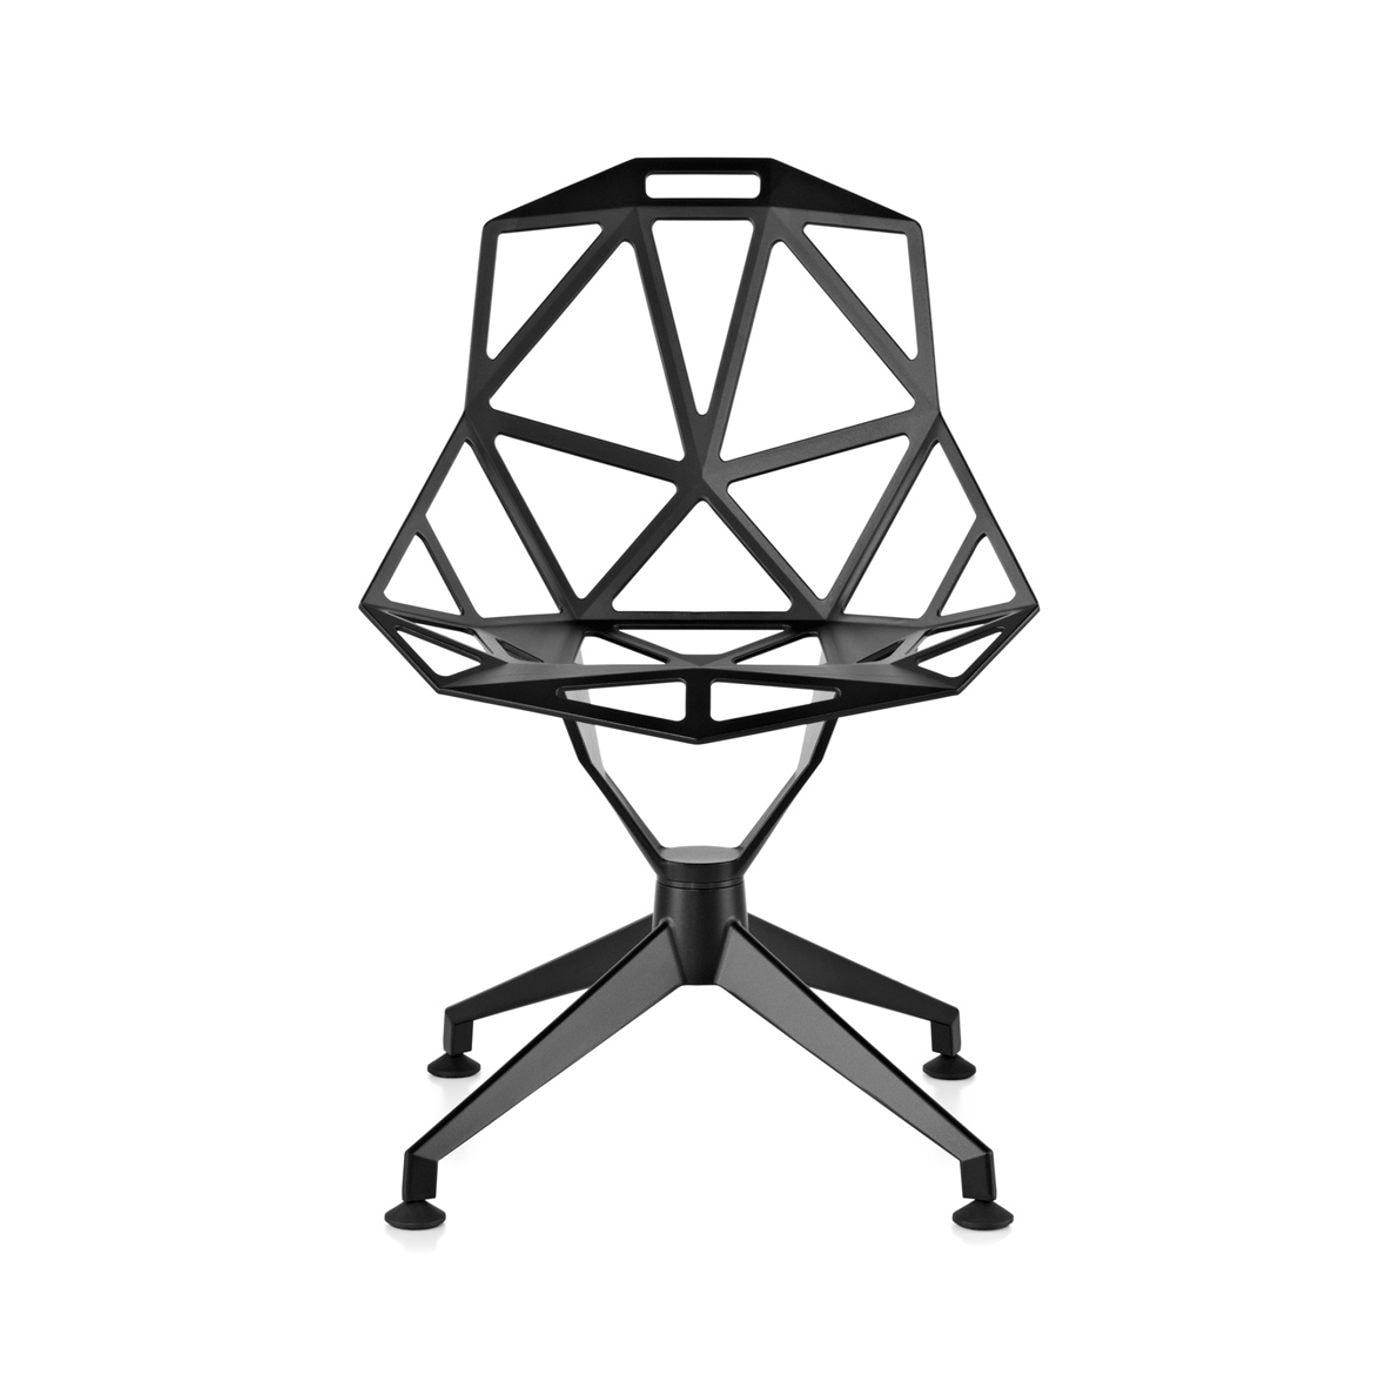 MAGIS_Chair one 4star sedia girevole